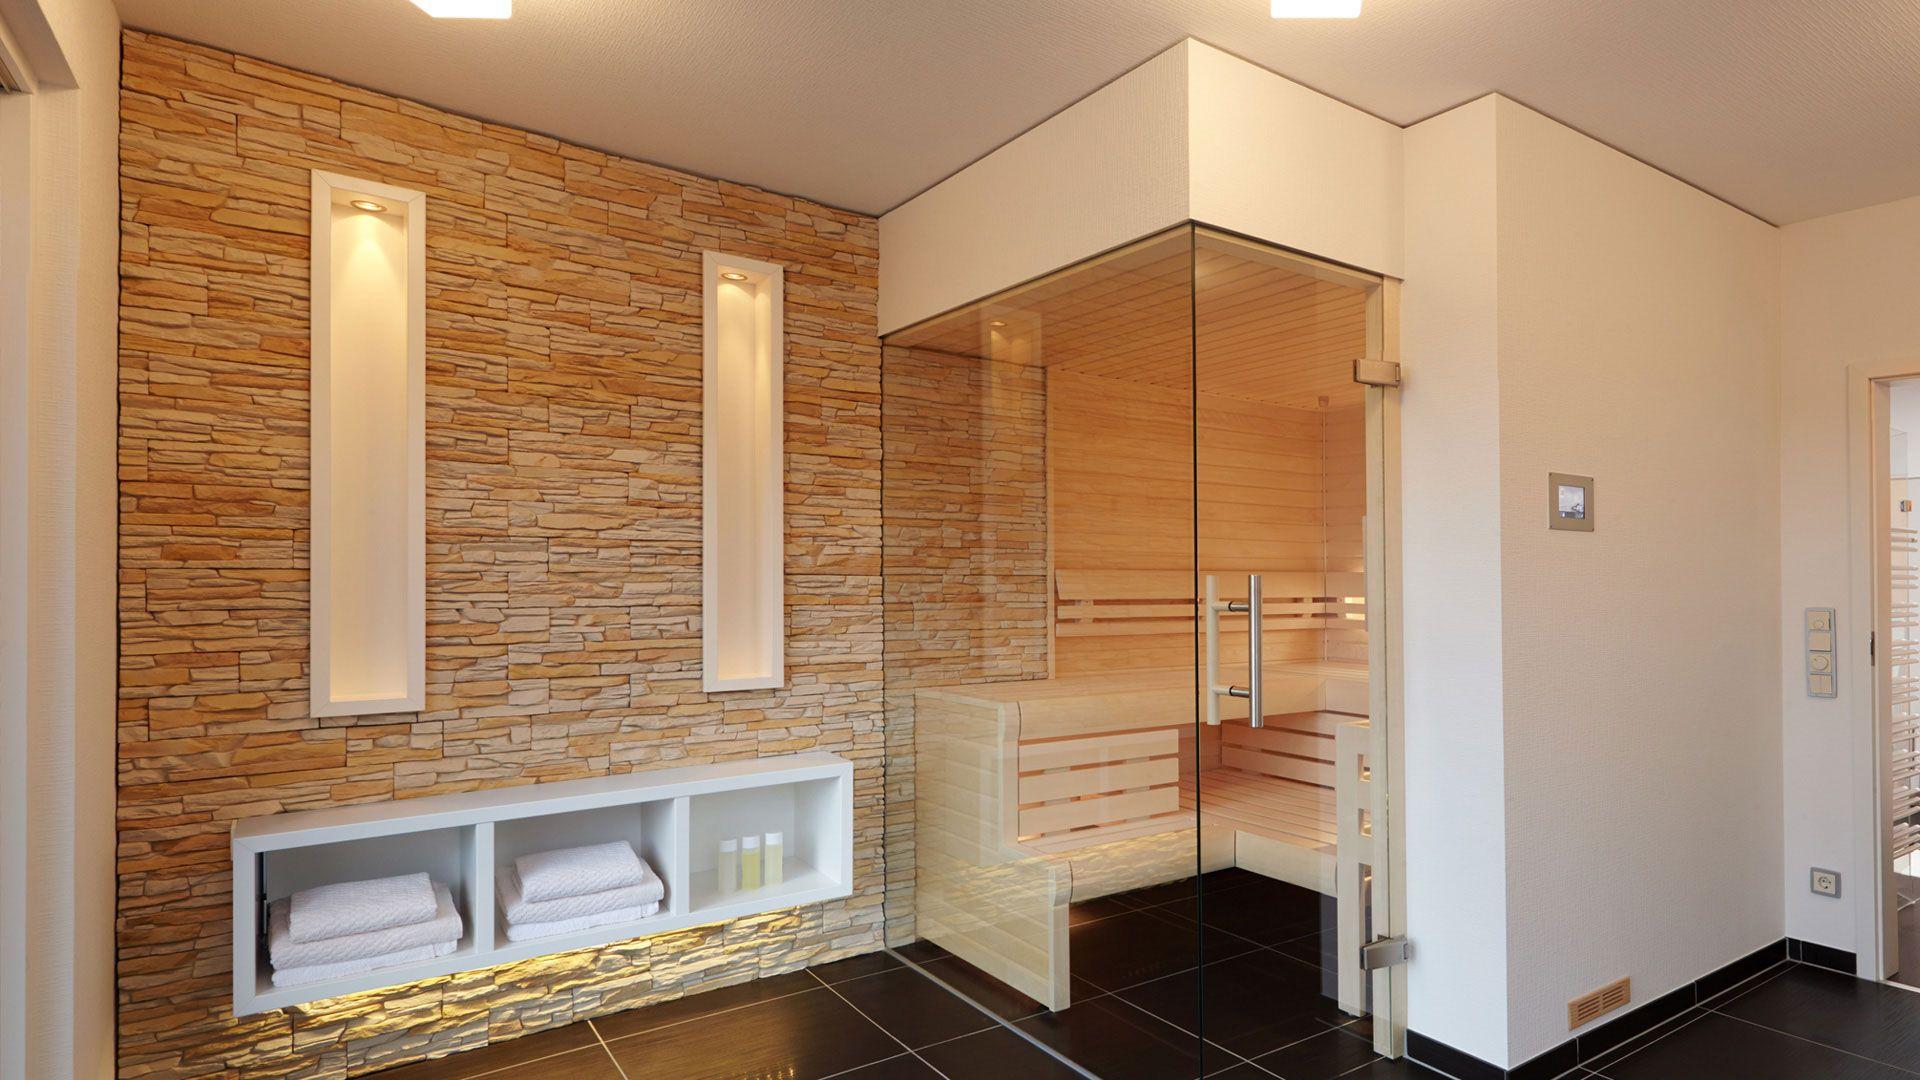 asiatische individuelle wellness romantische puristische rustikale sauna exklusive saunen. Black Bedroom Furniture Sets. Home Design Ideas